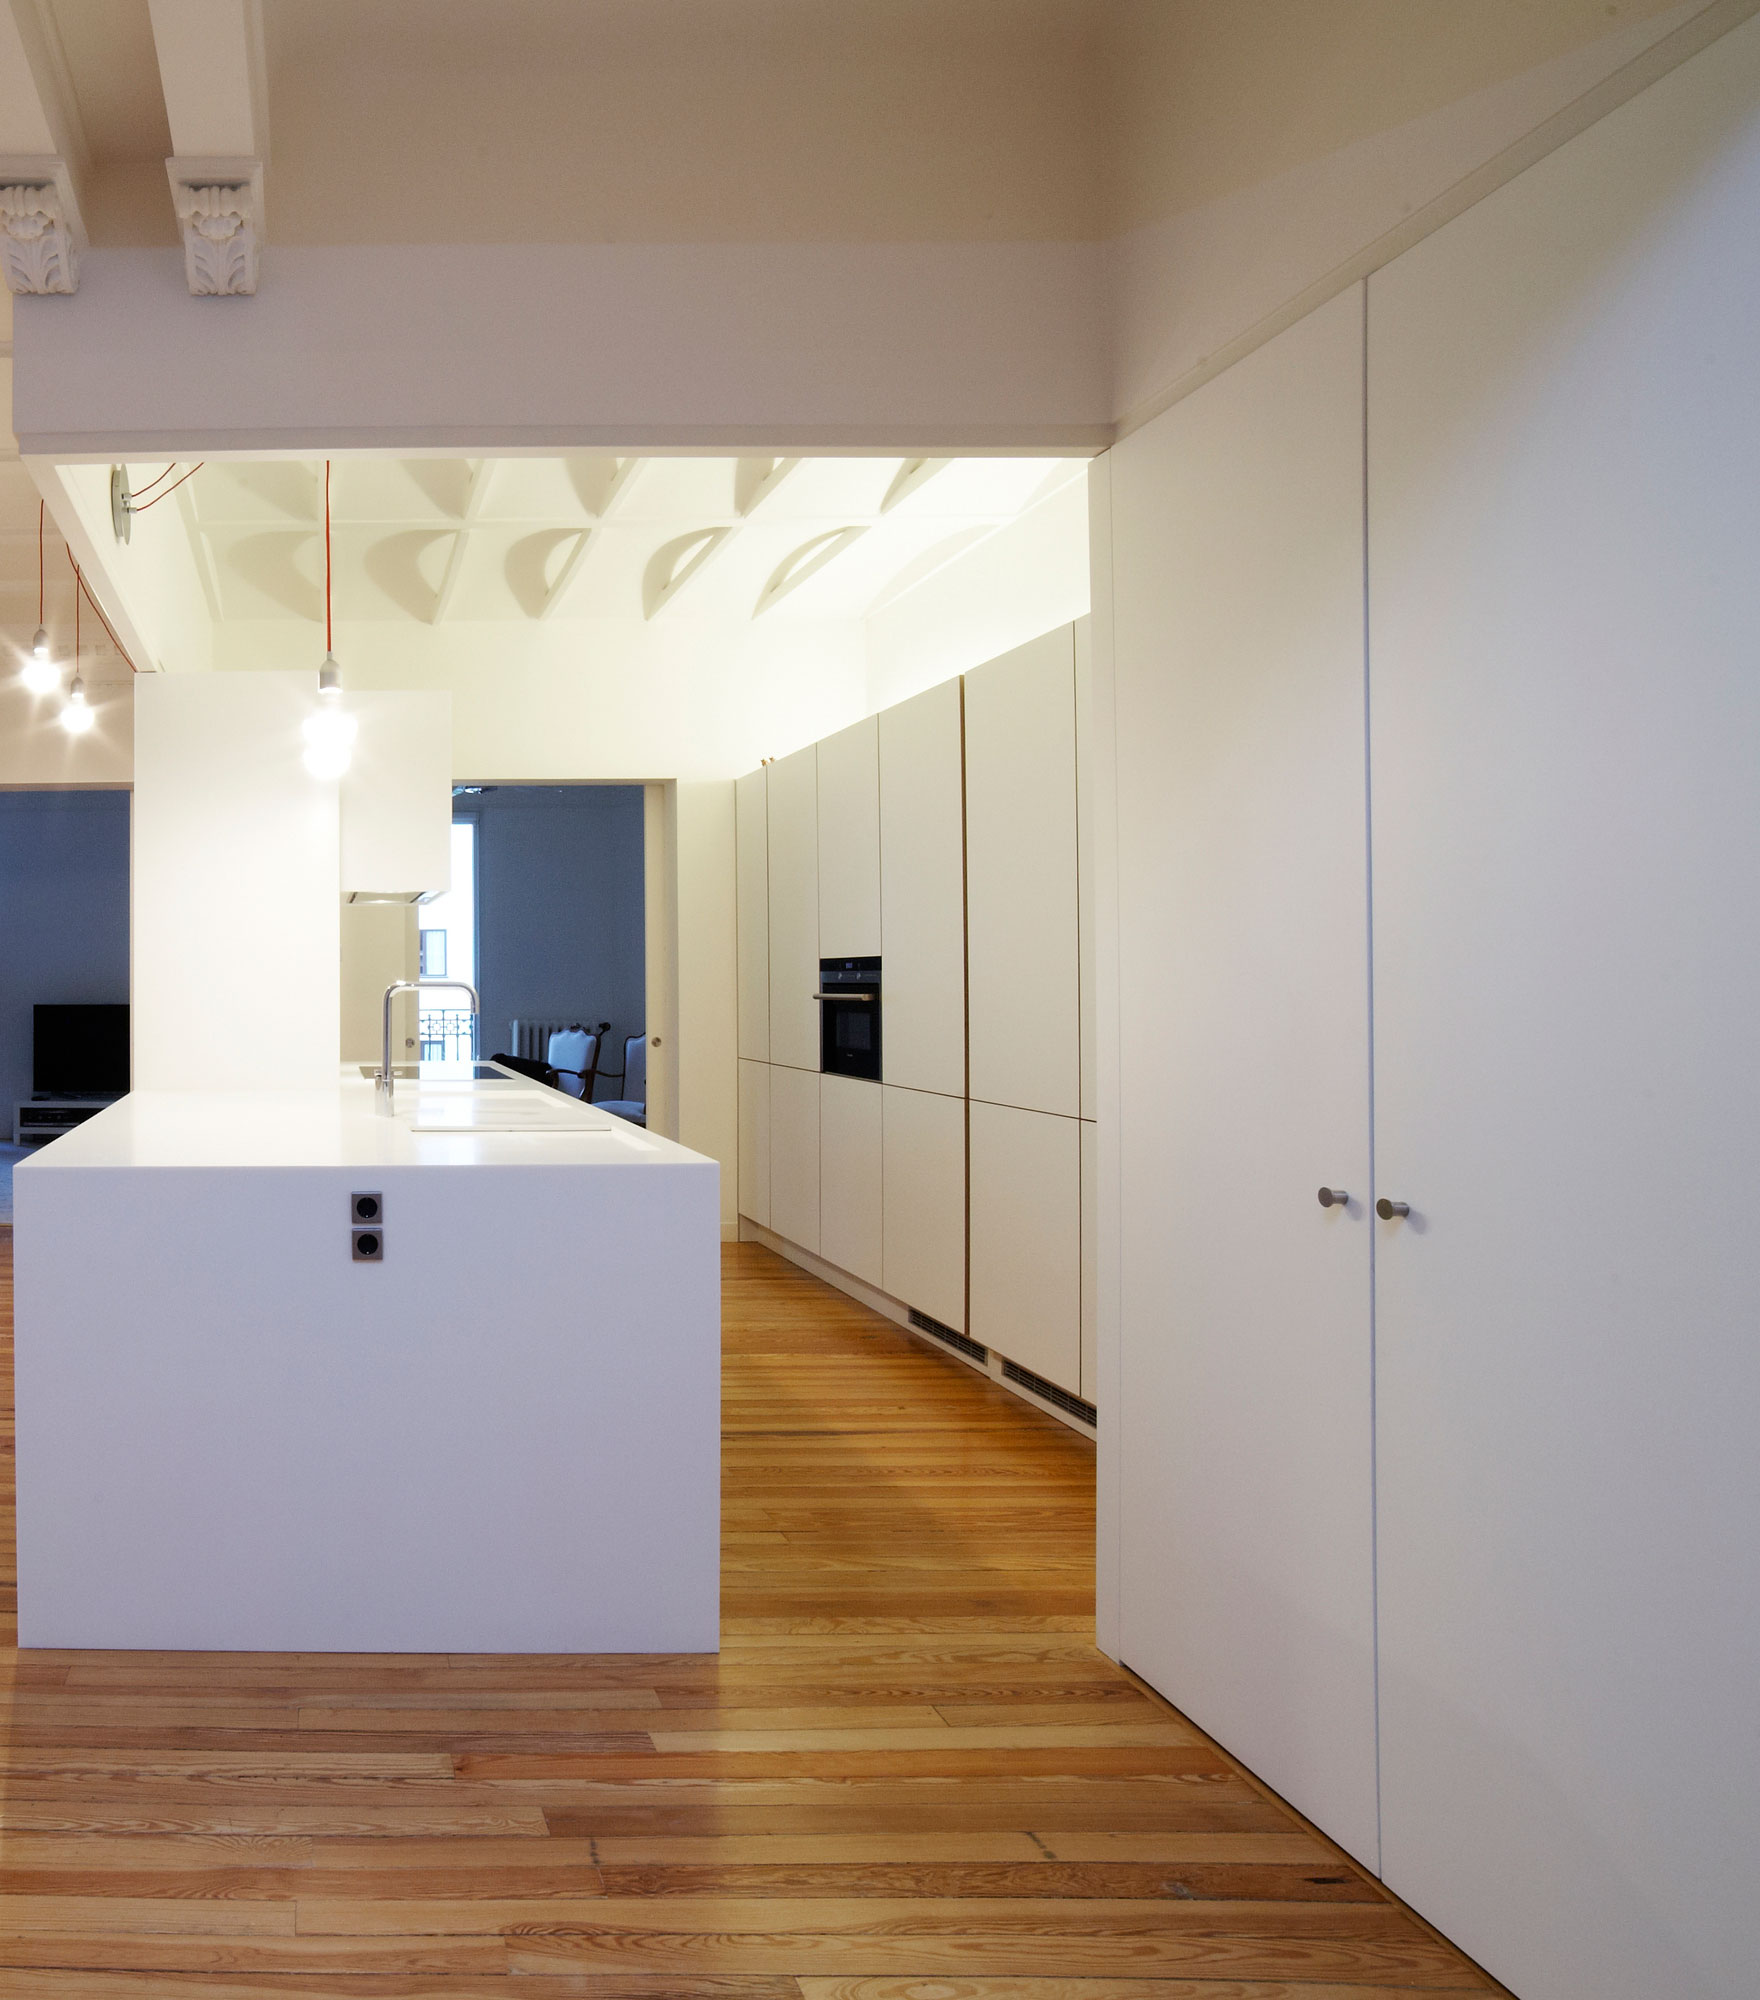 Ortega y Gasset Home by Beriot, Bernardini Arquitectos (5)